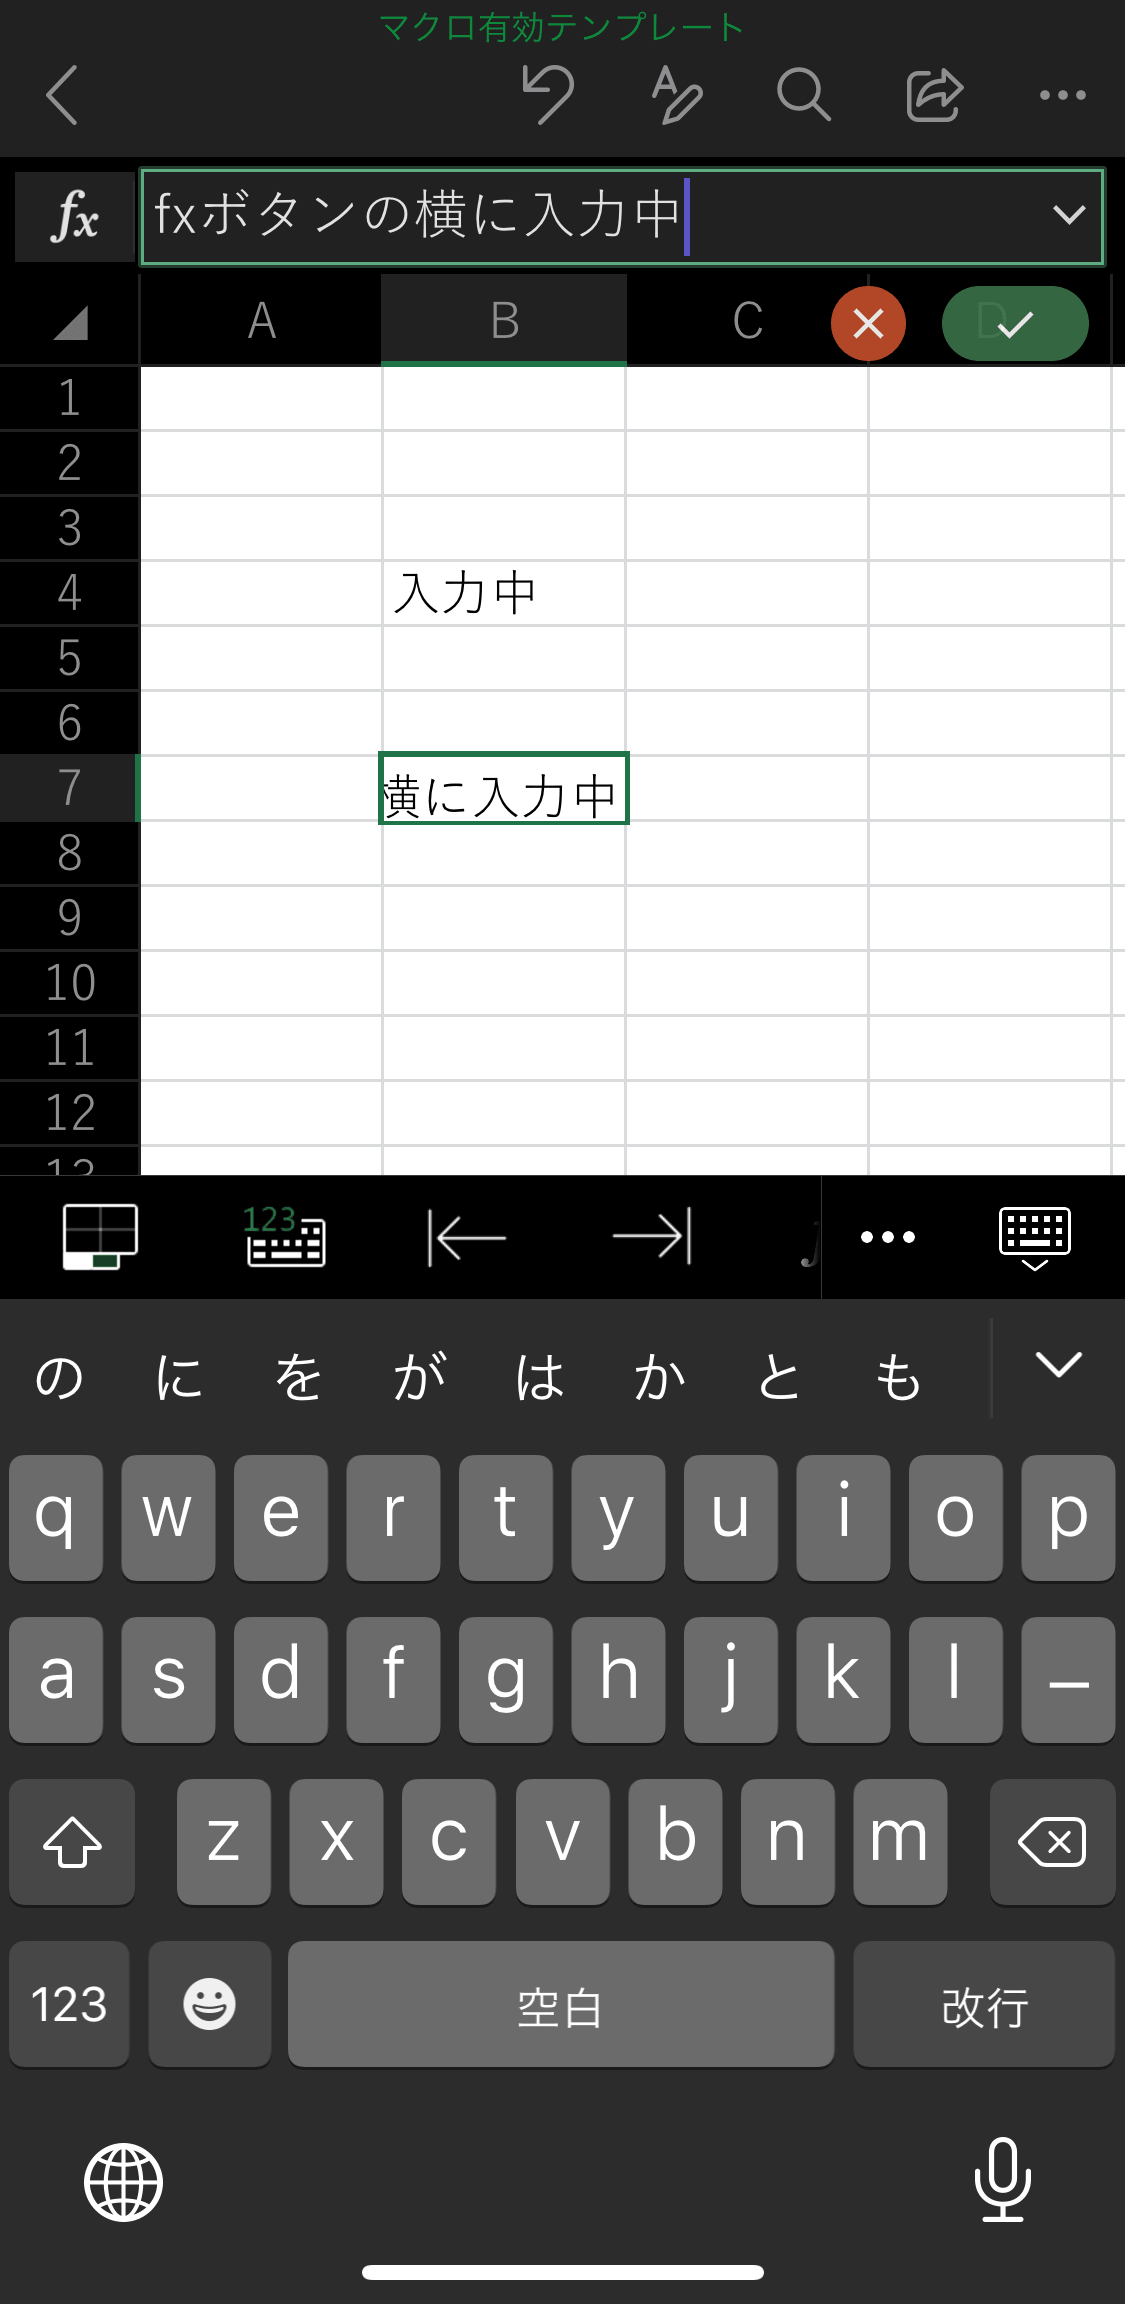 iPhoneでのエクセルアプリの使い方・編集方法・保存方法12